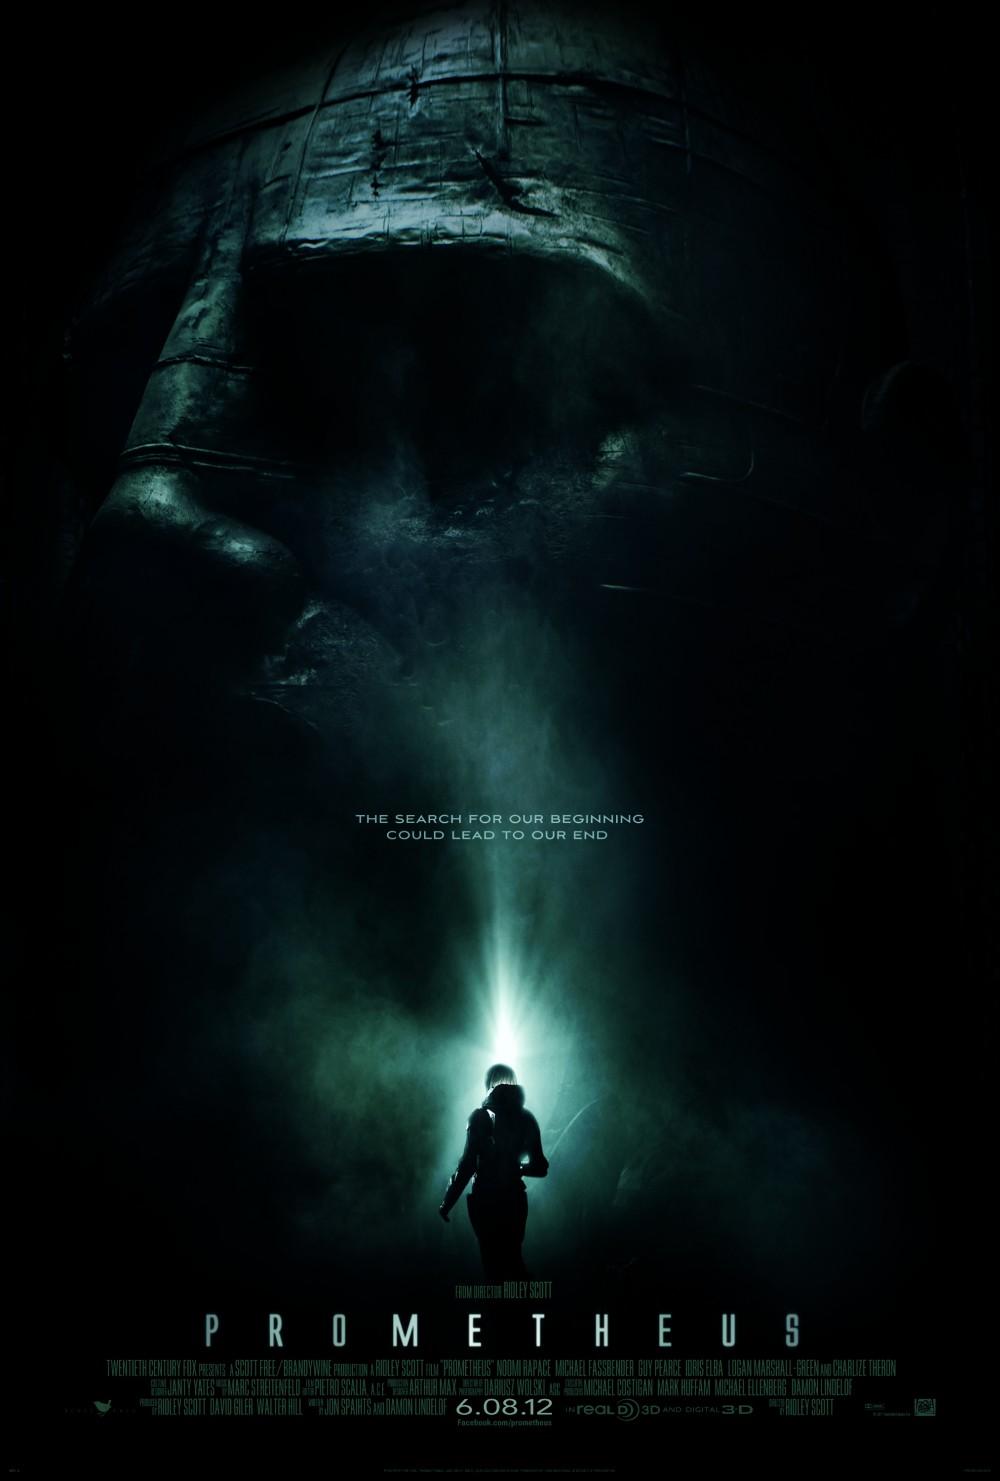 promethesus-movie-poster-teaser-03.jpg